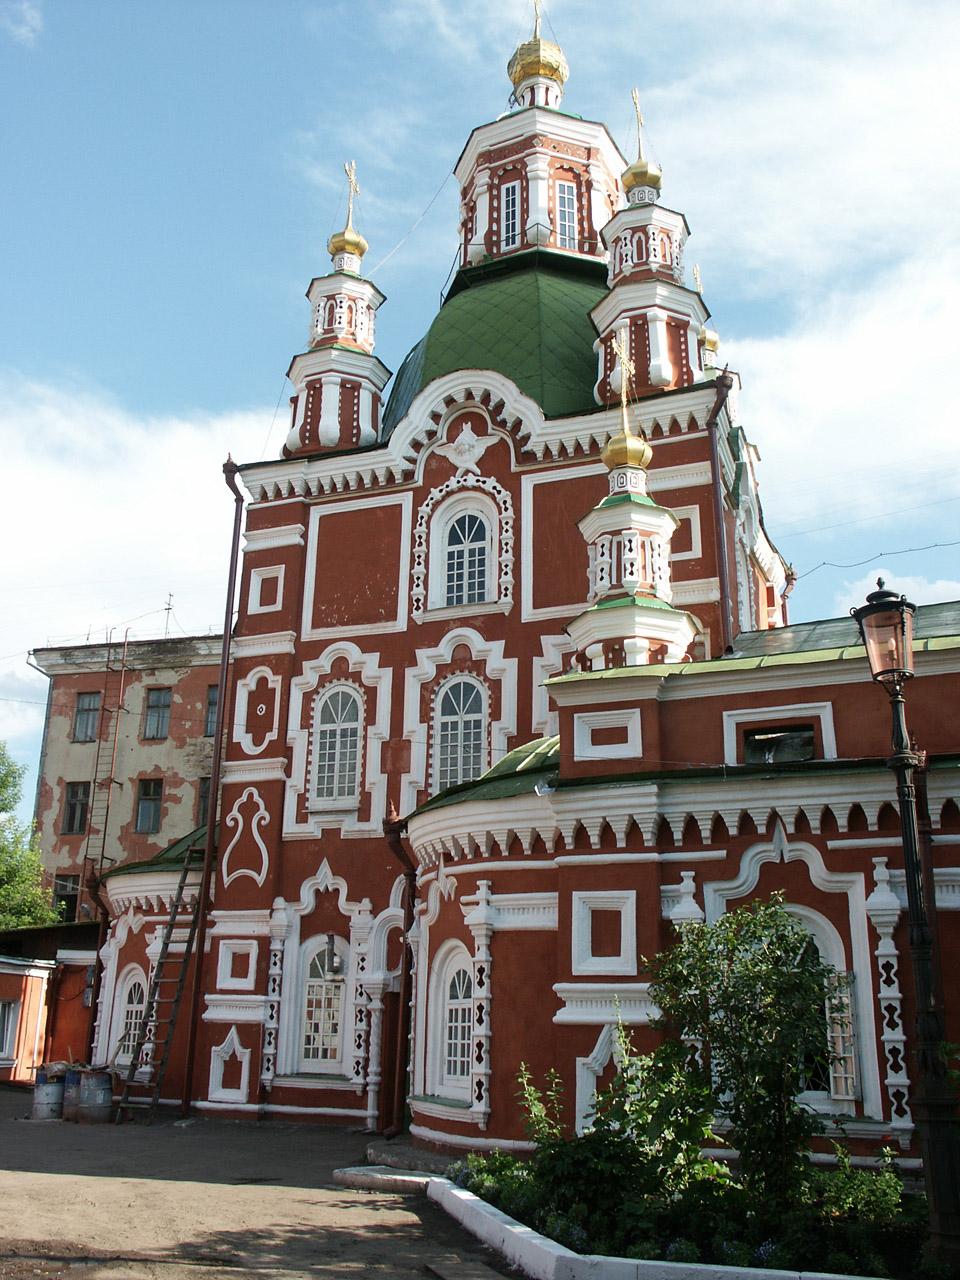 Церковь в Красноярске: www.kartinki24.ru/kartinki/architecture/3840-kartinka-19.html